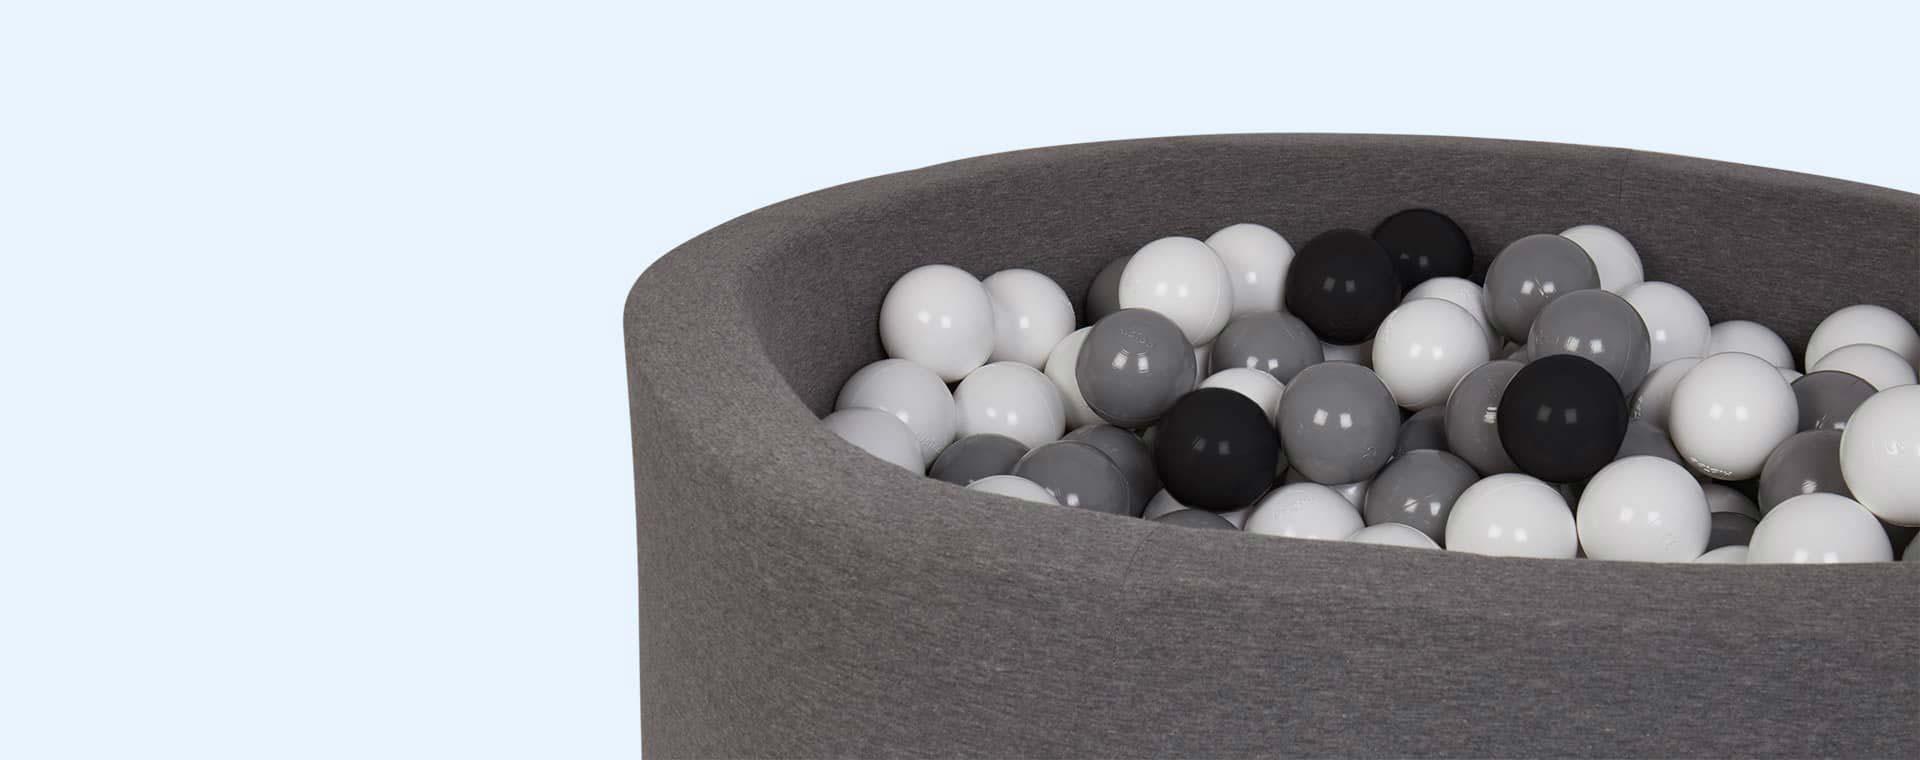 Grey Misioo Circle Ball Pit